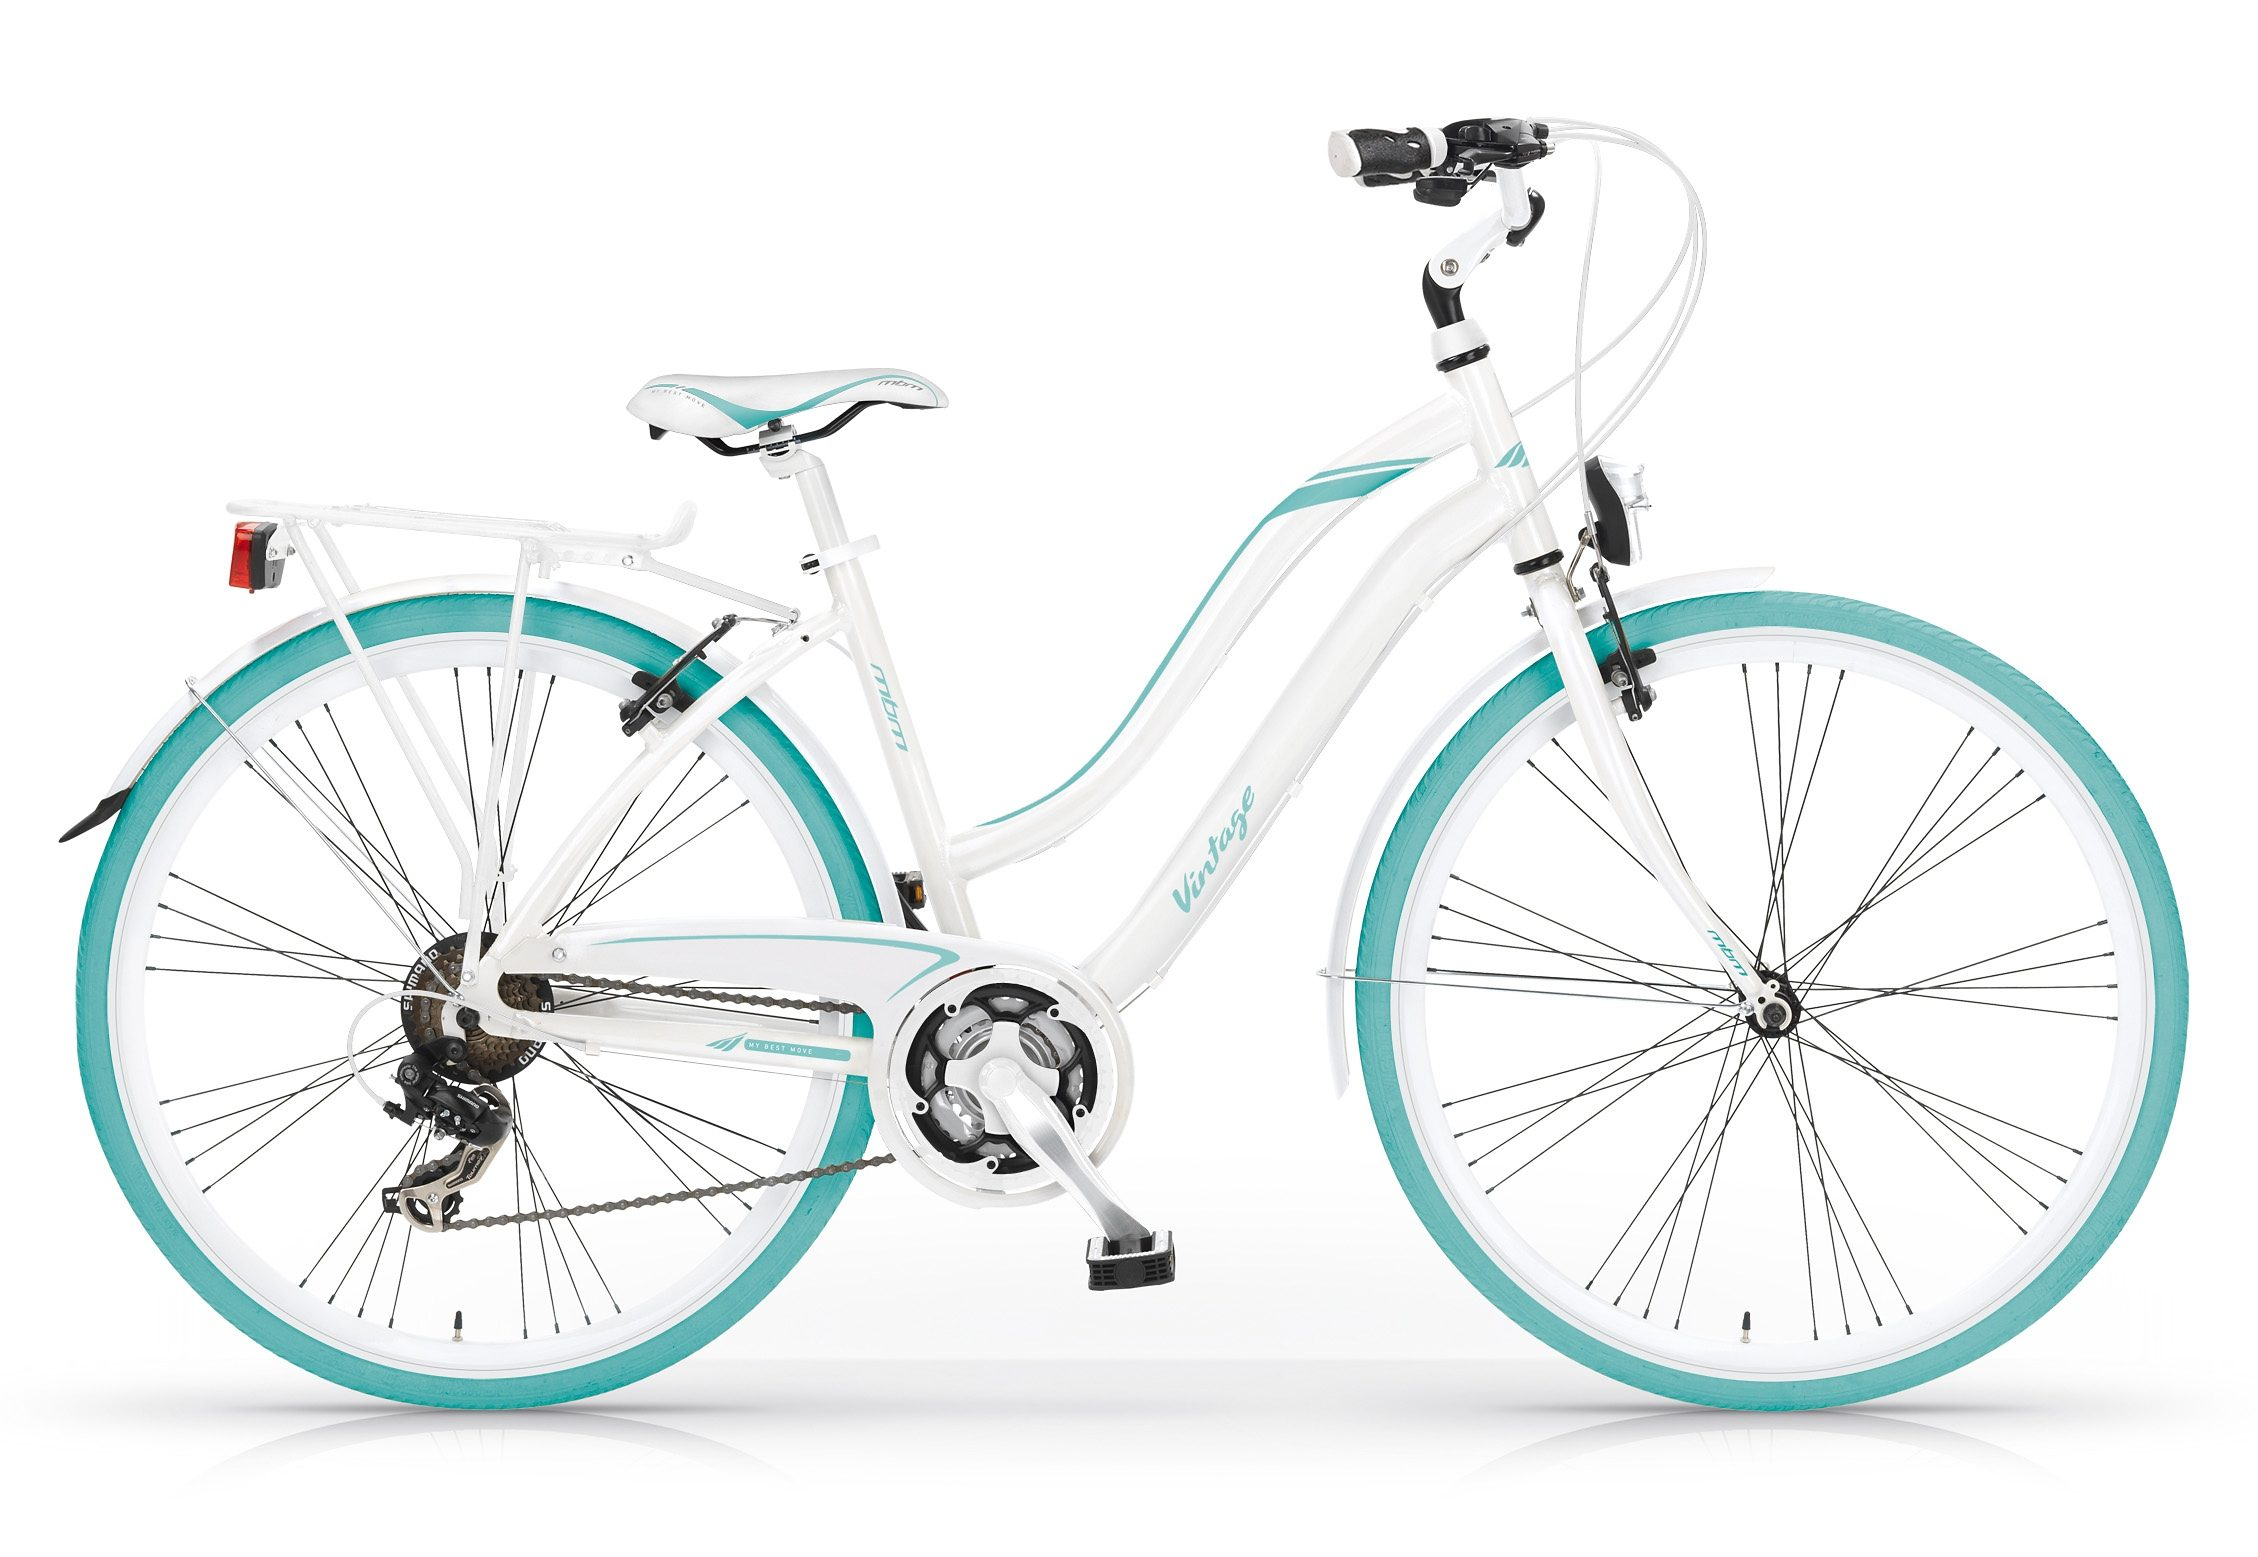 Trekkingbike Damen, 28 Zoll, 21-Gang Shimano, »Vintage 834«, MBM